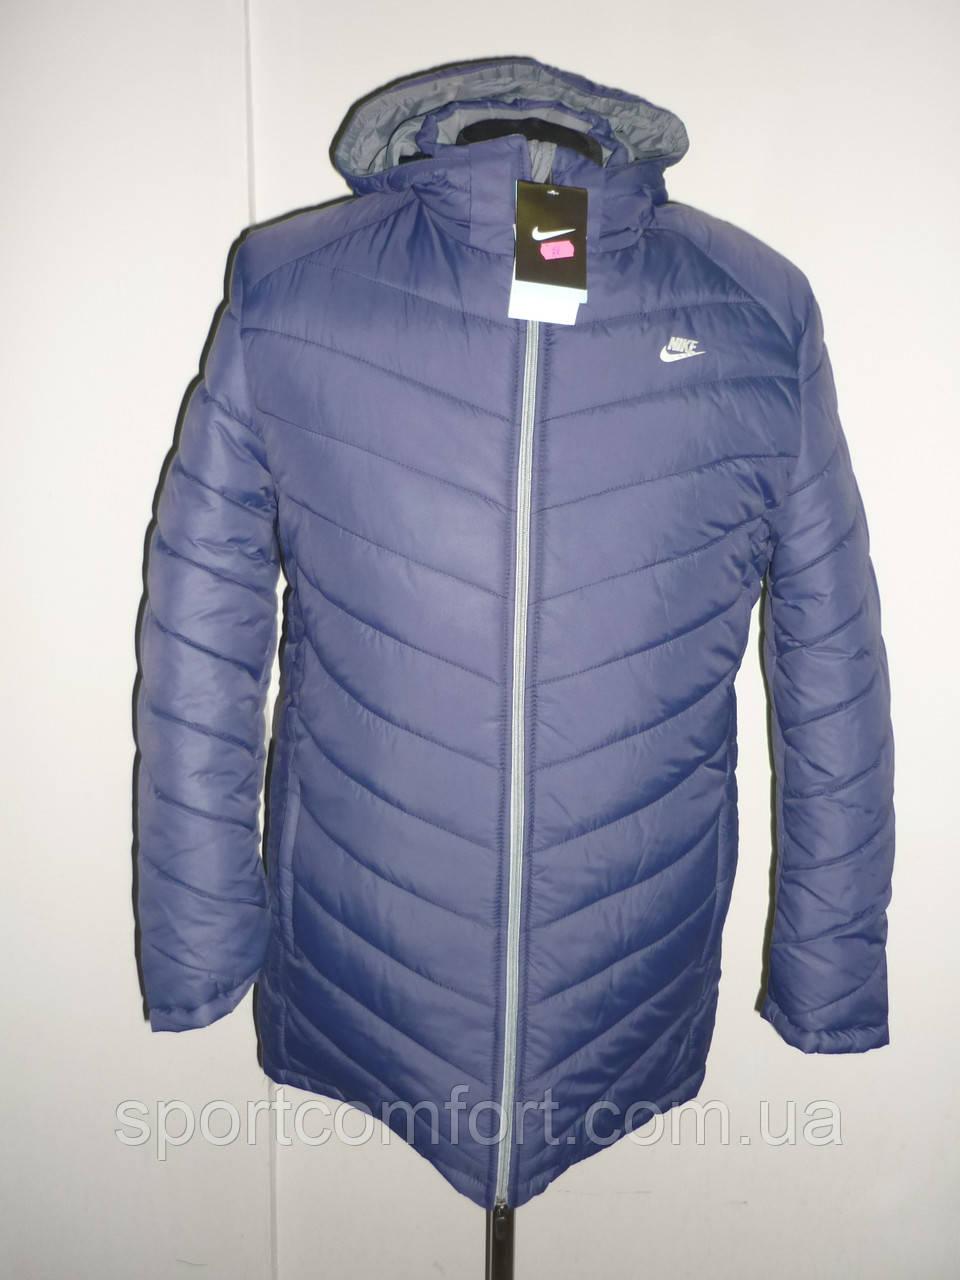 c98cbf03 Куртка Nike синяя 28 зима, цена 600 грн., купить Суми — Prom.ua (ID ...